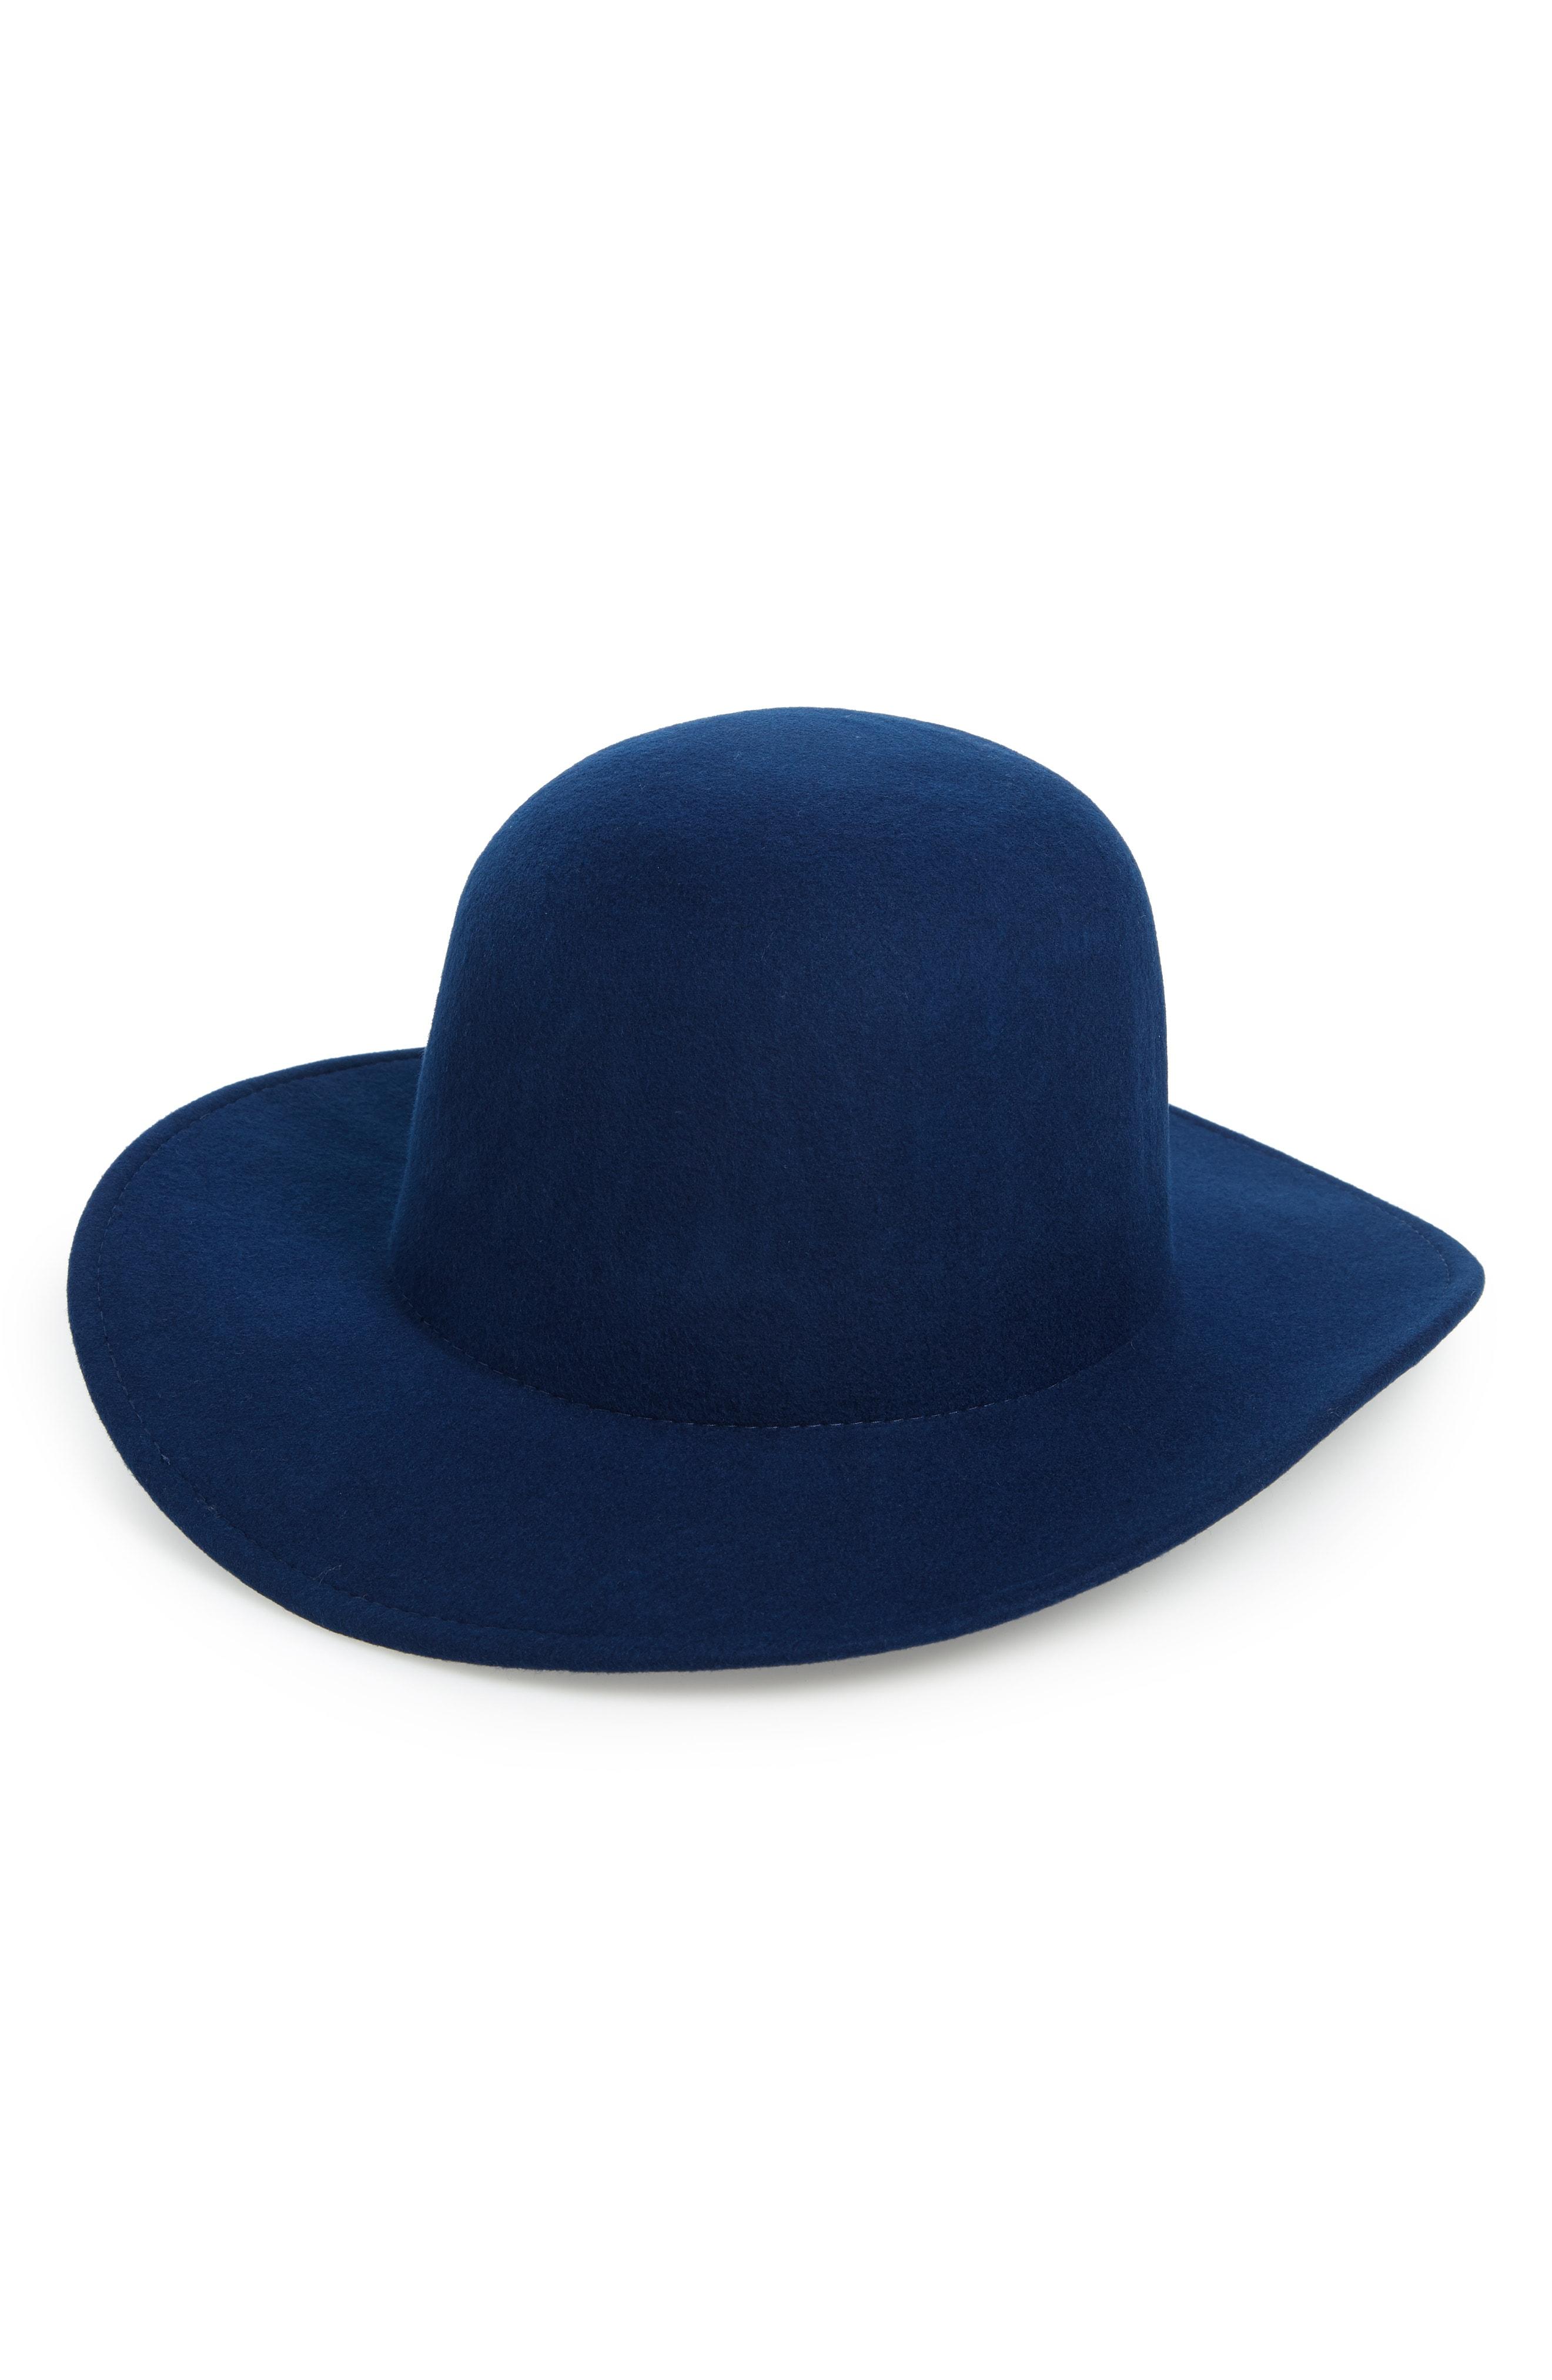 Madewell x Biltmore Dome Felt Hat